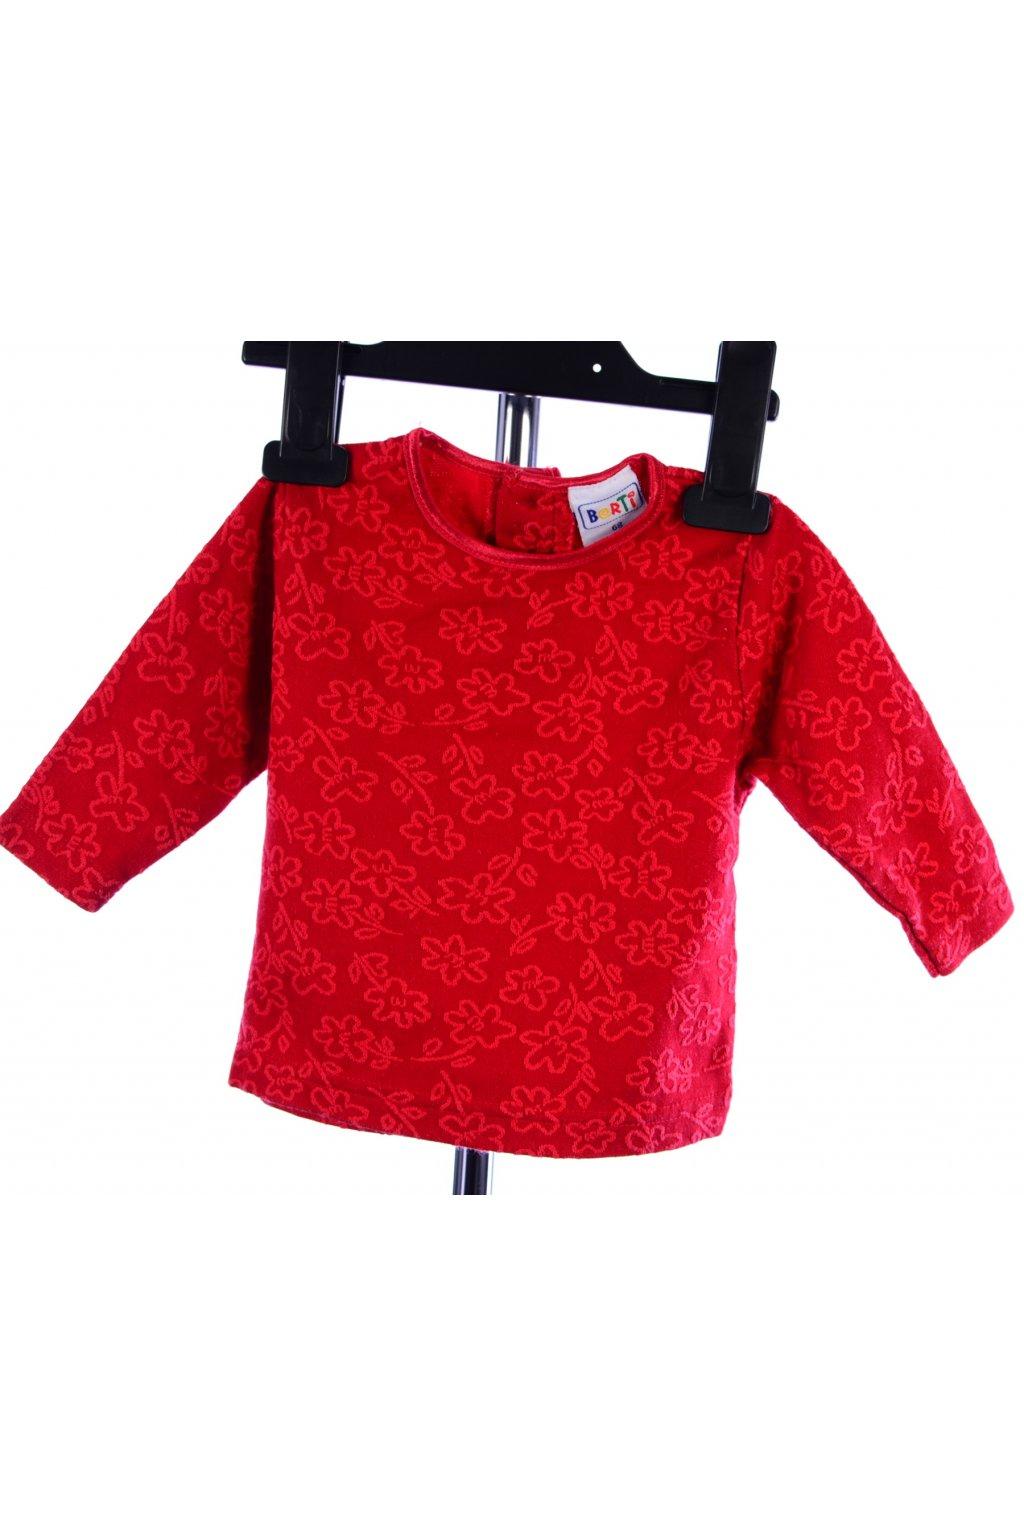 Tričko Borti červené vel. 68